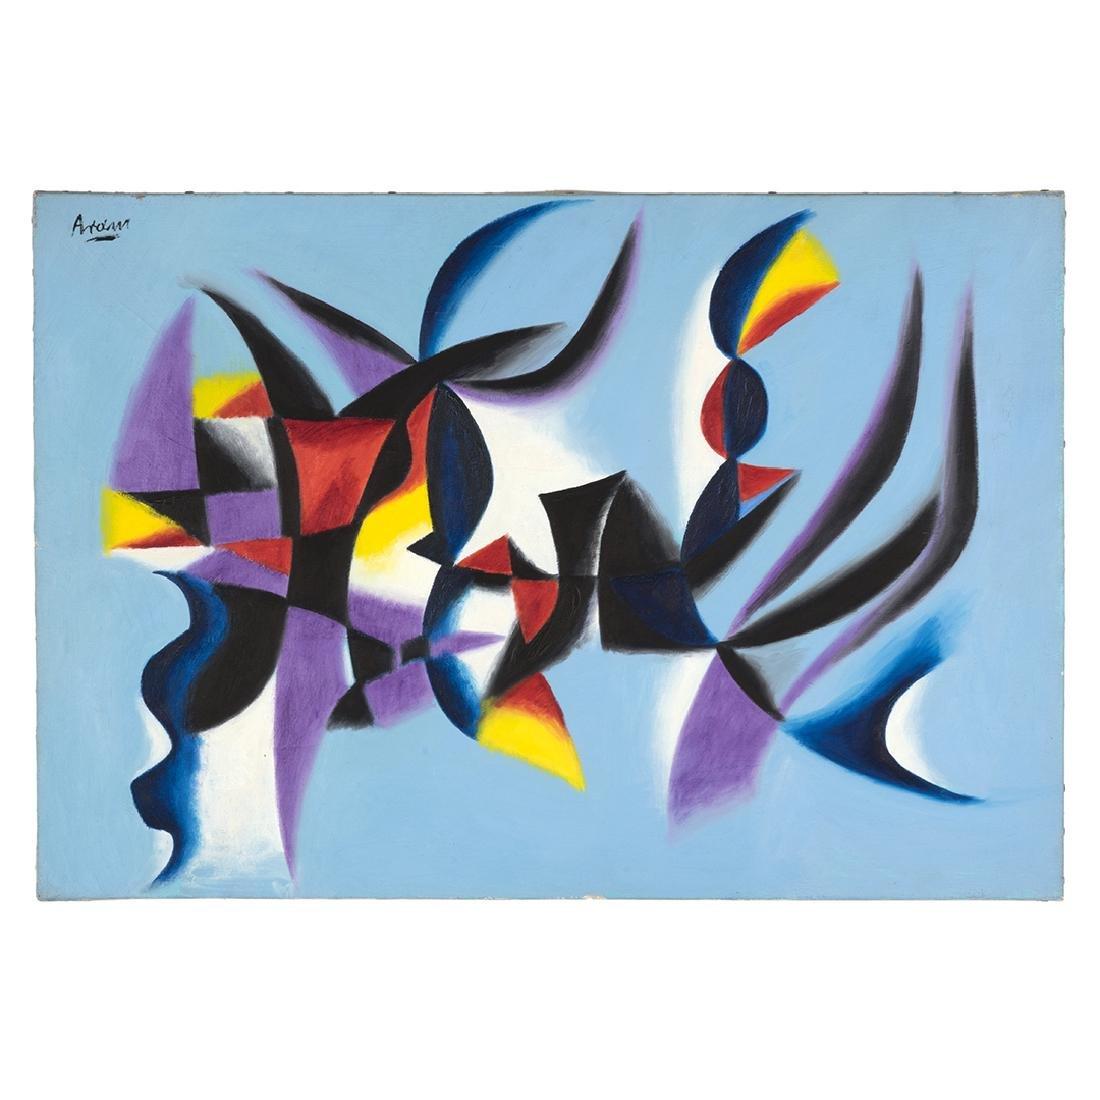 Gottlieb Michael Aram Untitled Paintings (2) - 4